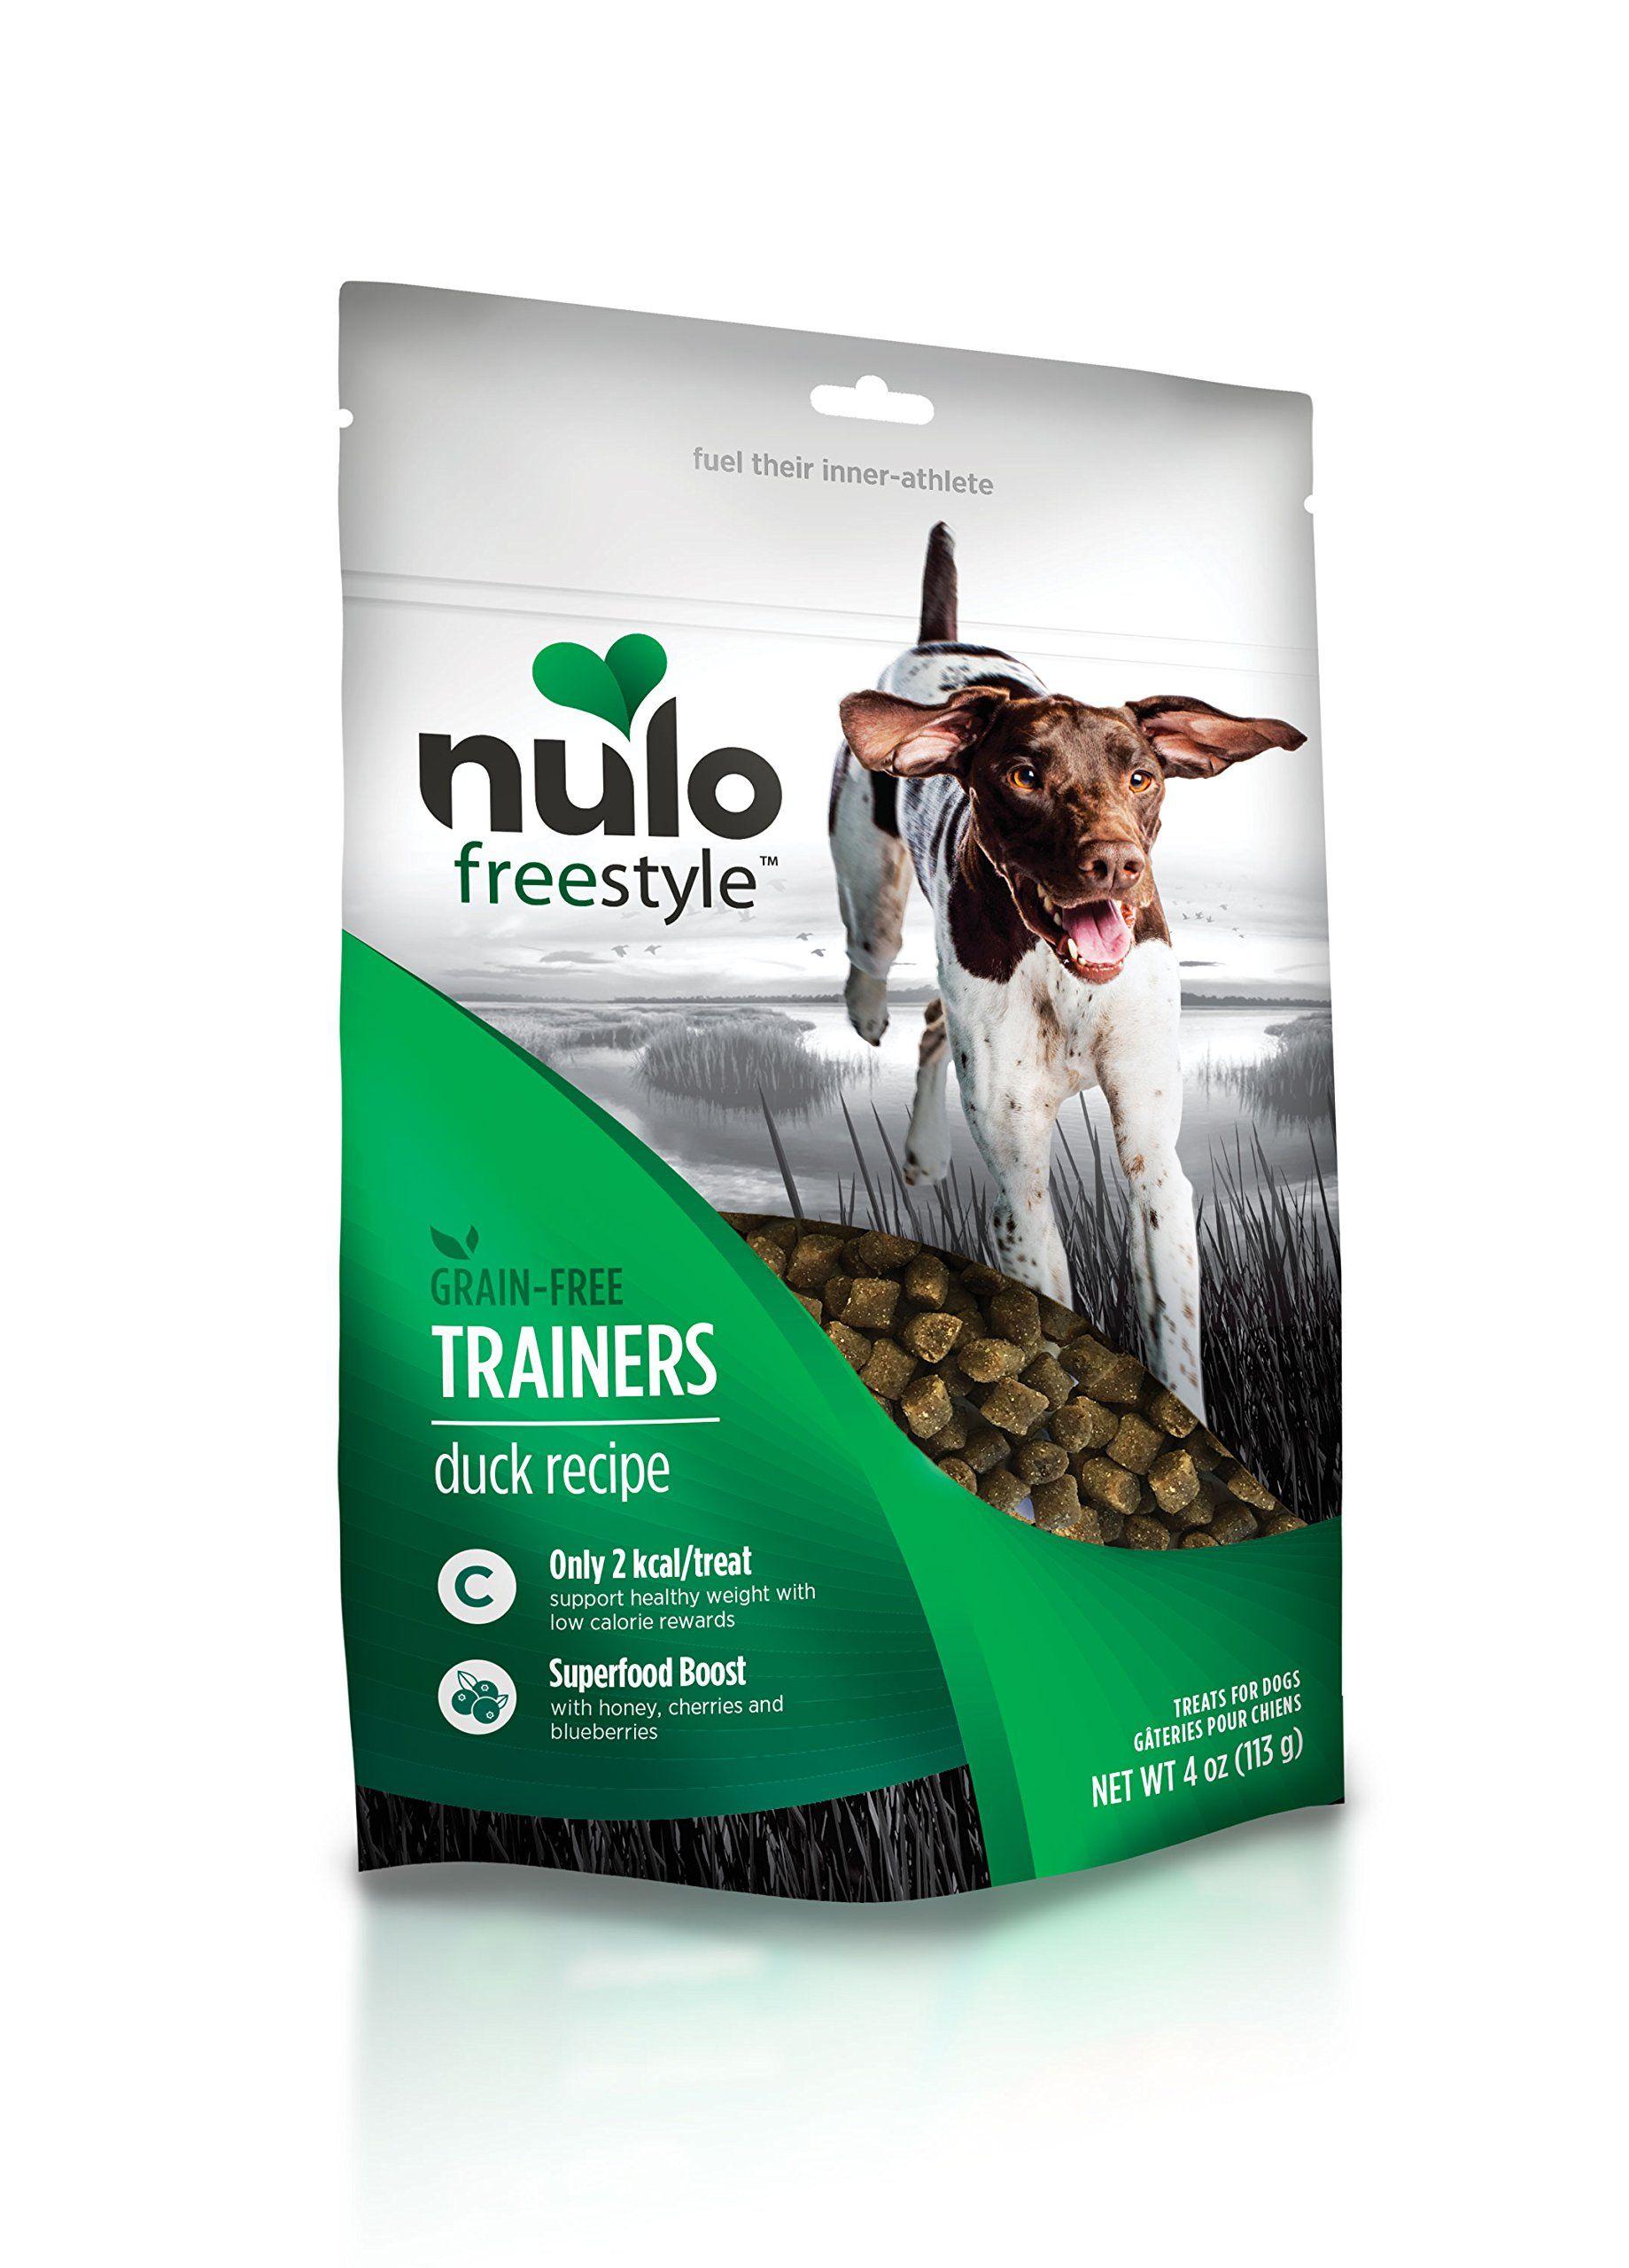 Nulo Freestyle Trainers Dog Treats Grain Free Dog Training Treats